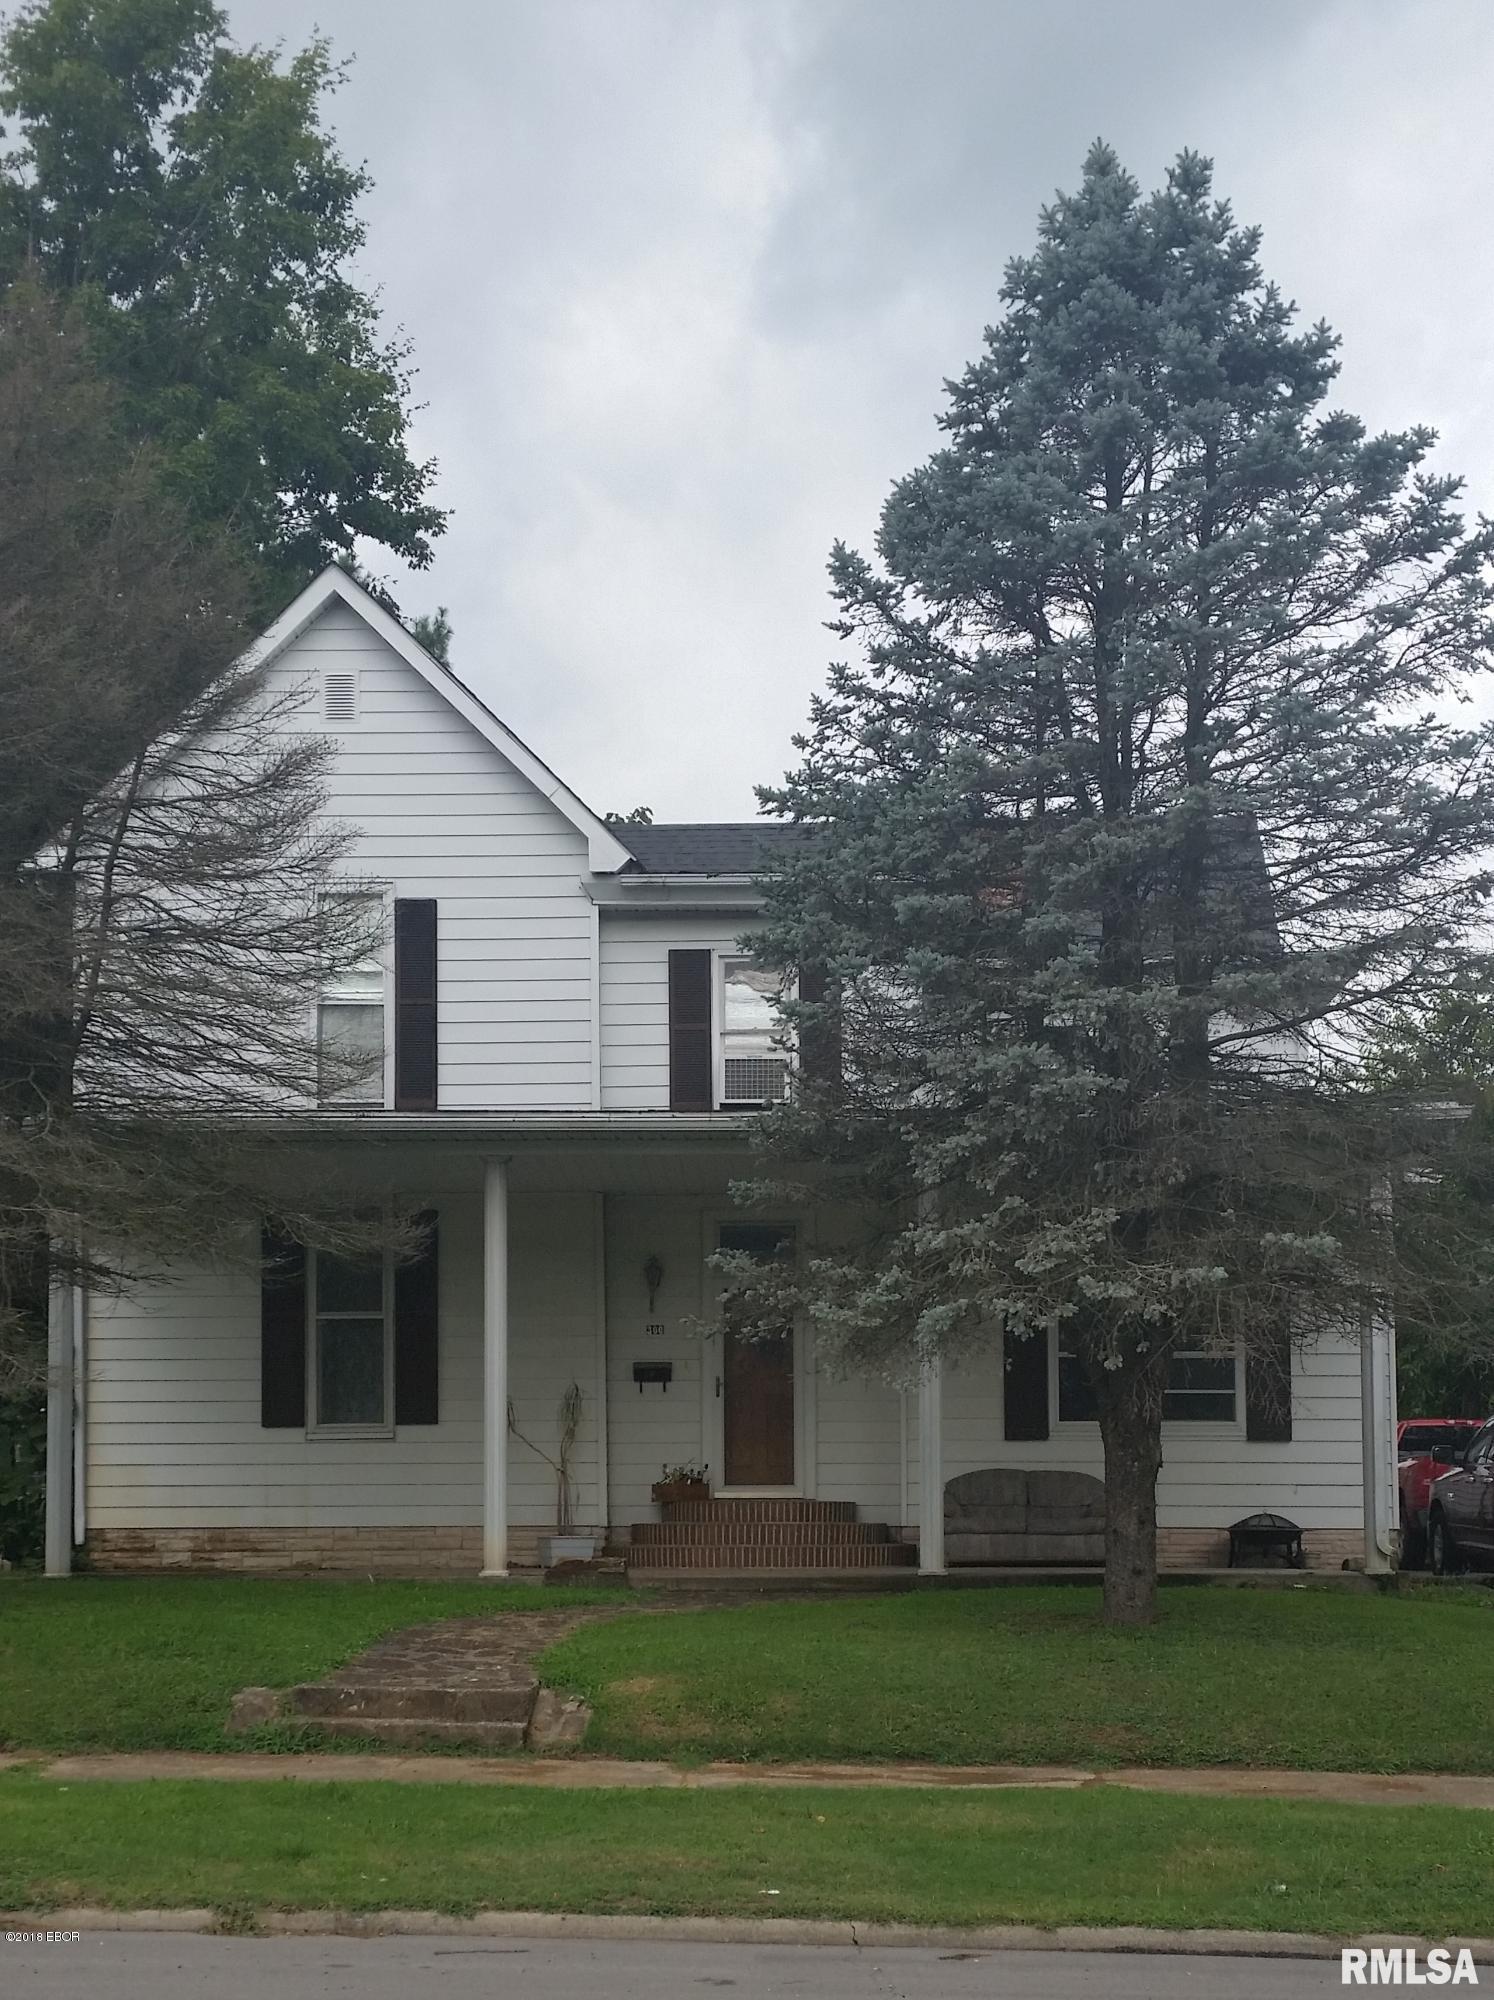 300 N WASHINGTON Property Photo - McLeansboro, IL real estate listing